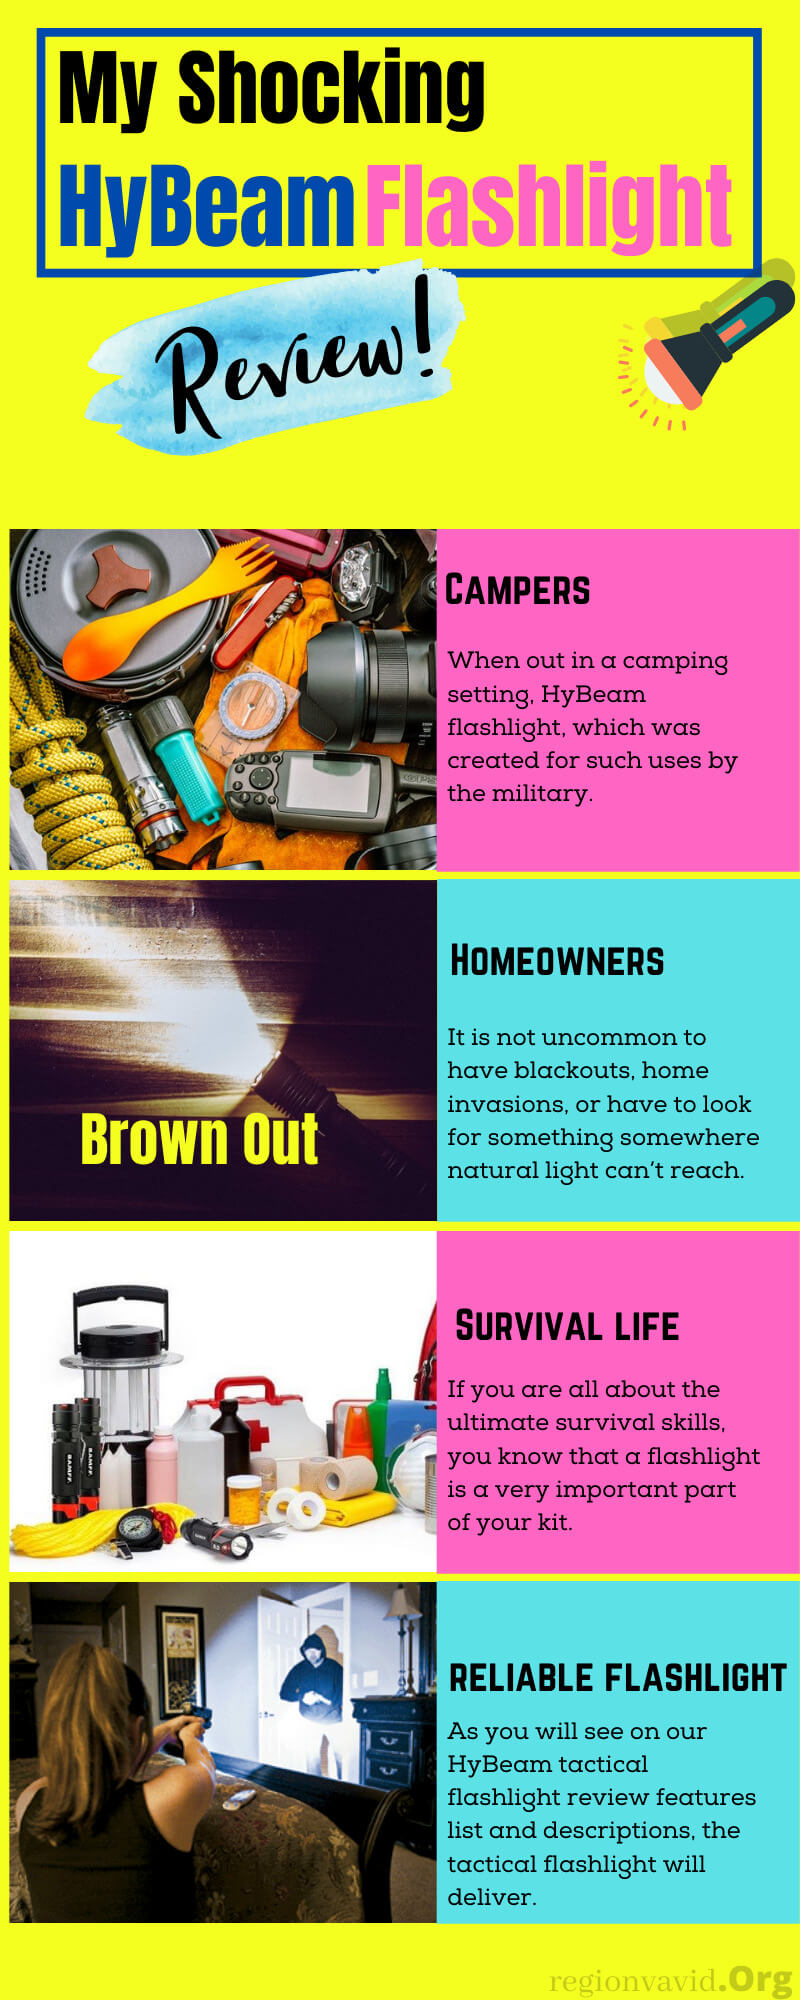 HyBeam Flashlight Benefits